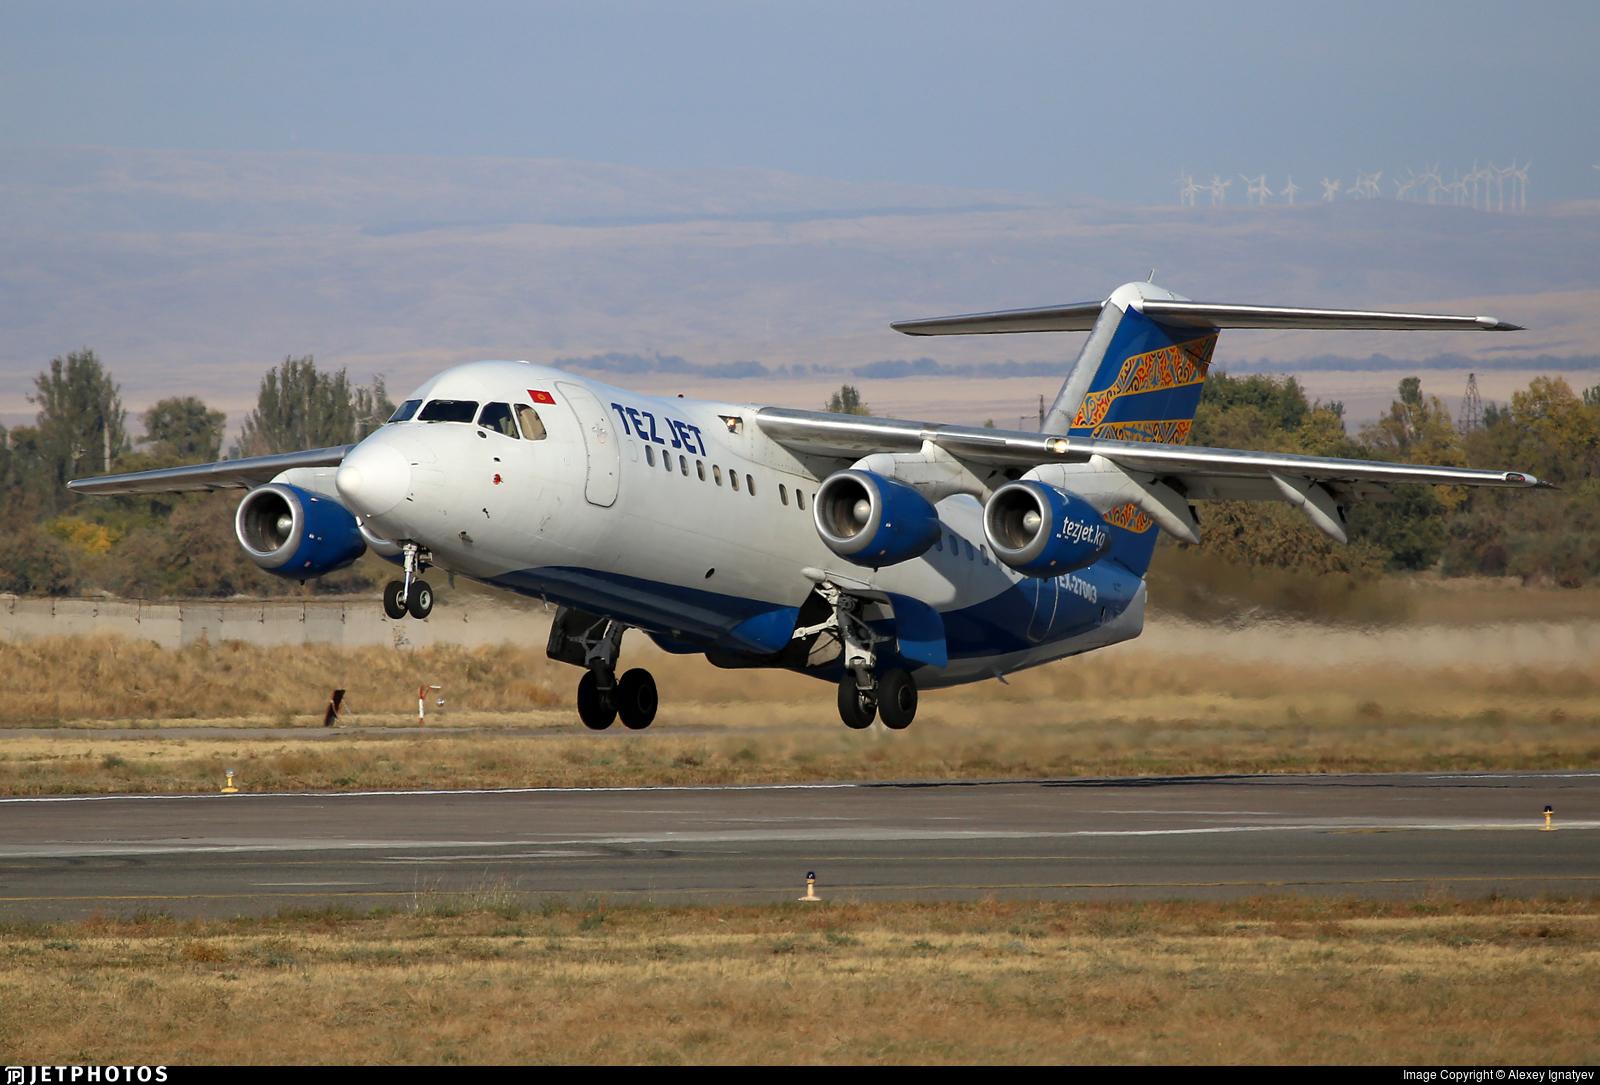 Airport codes history origin how they came to be FRU Bishkek Kyrgyzstan